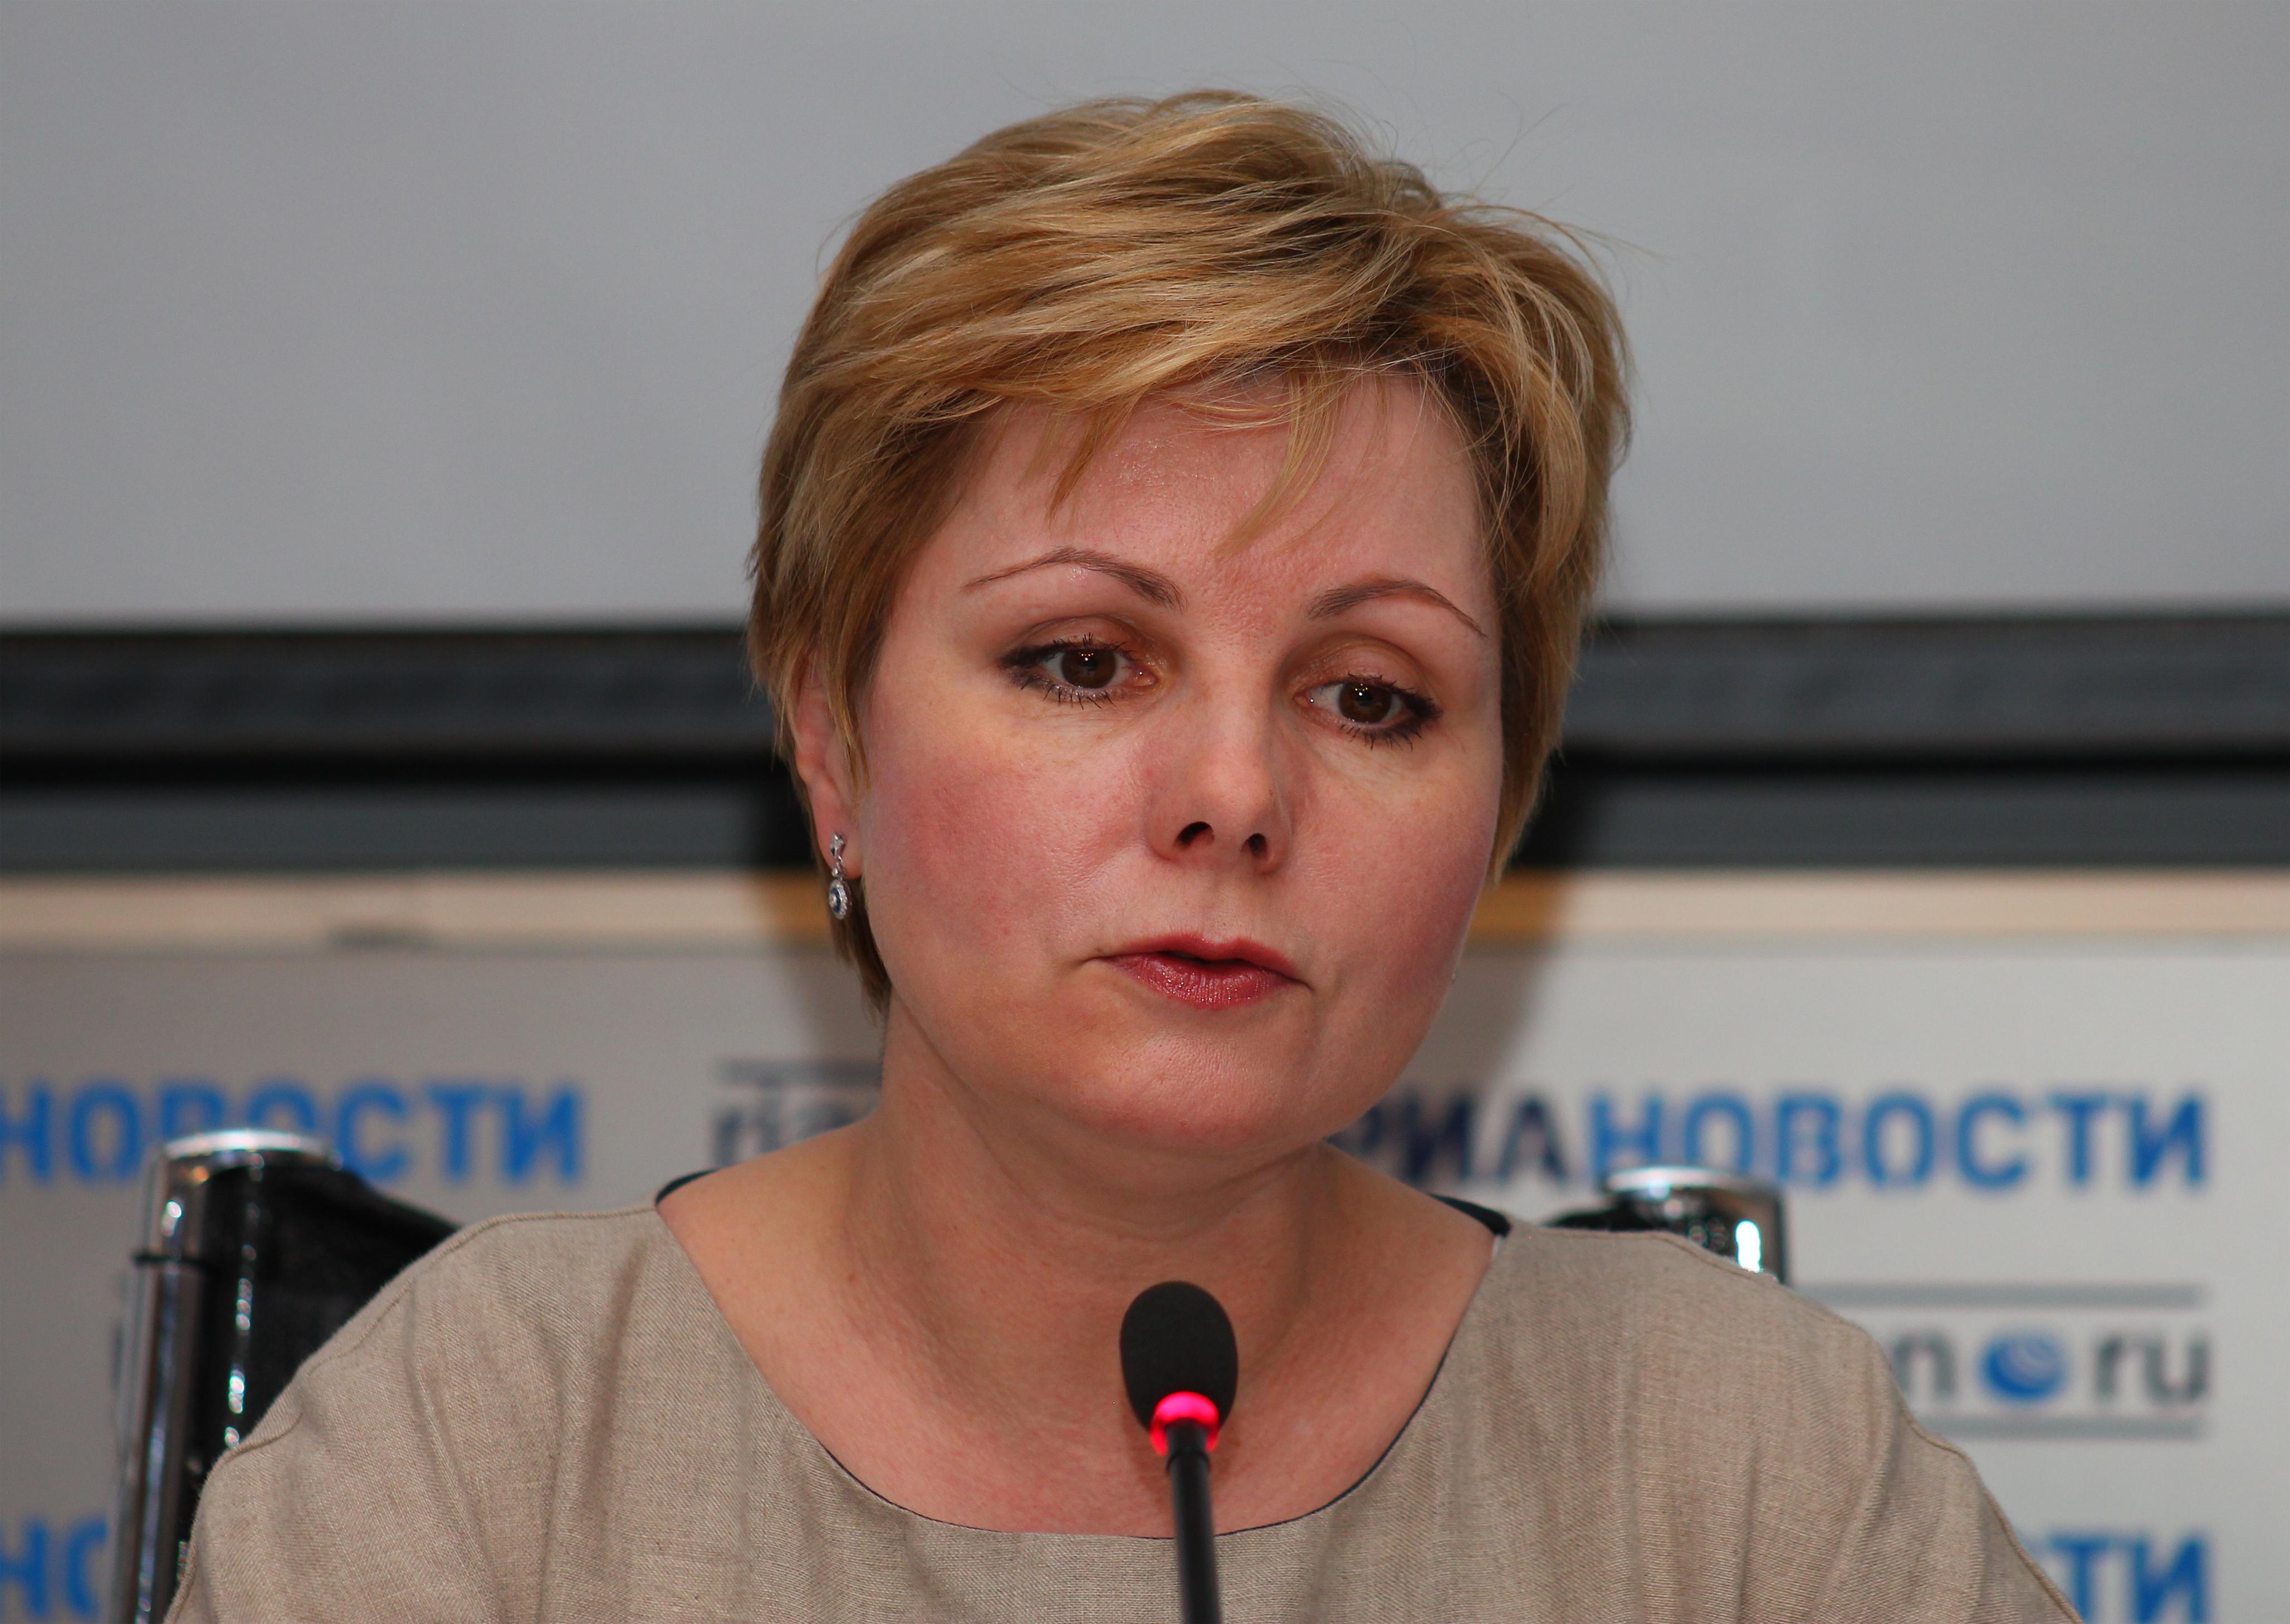 galina yurievna gagarina - photo #8